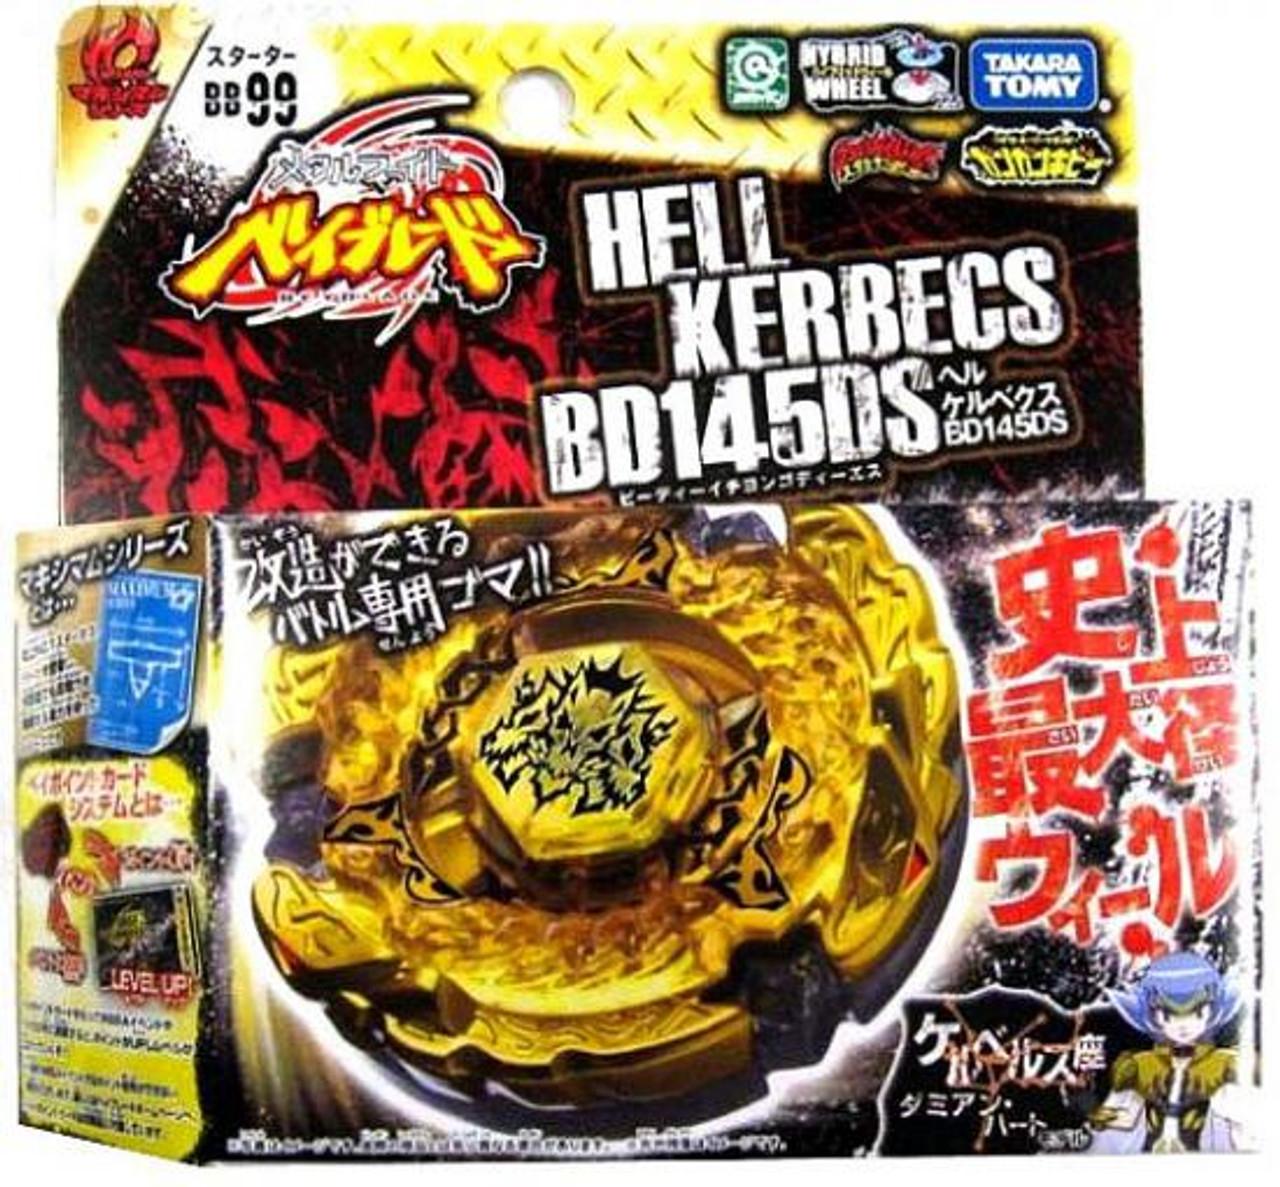 Beyblade Metal Fusion Japanese Hell Kerbecs Starter Set BB-99 [MR145DS]